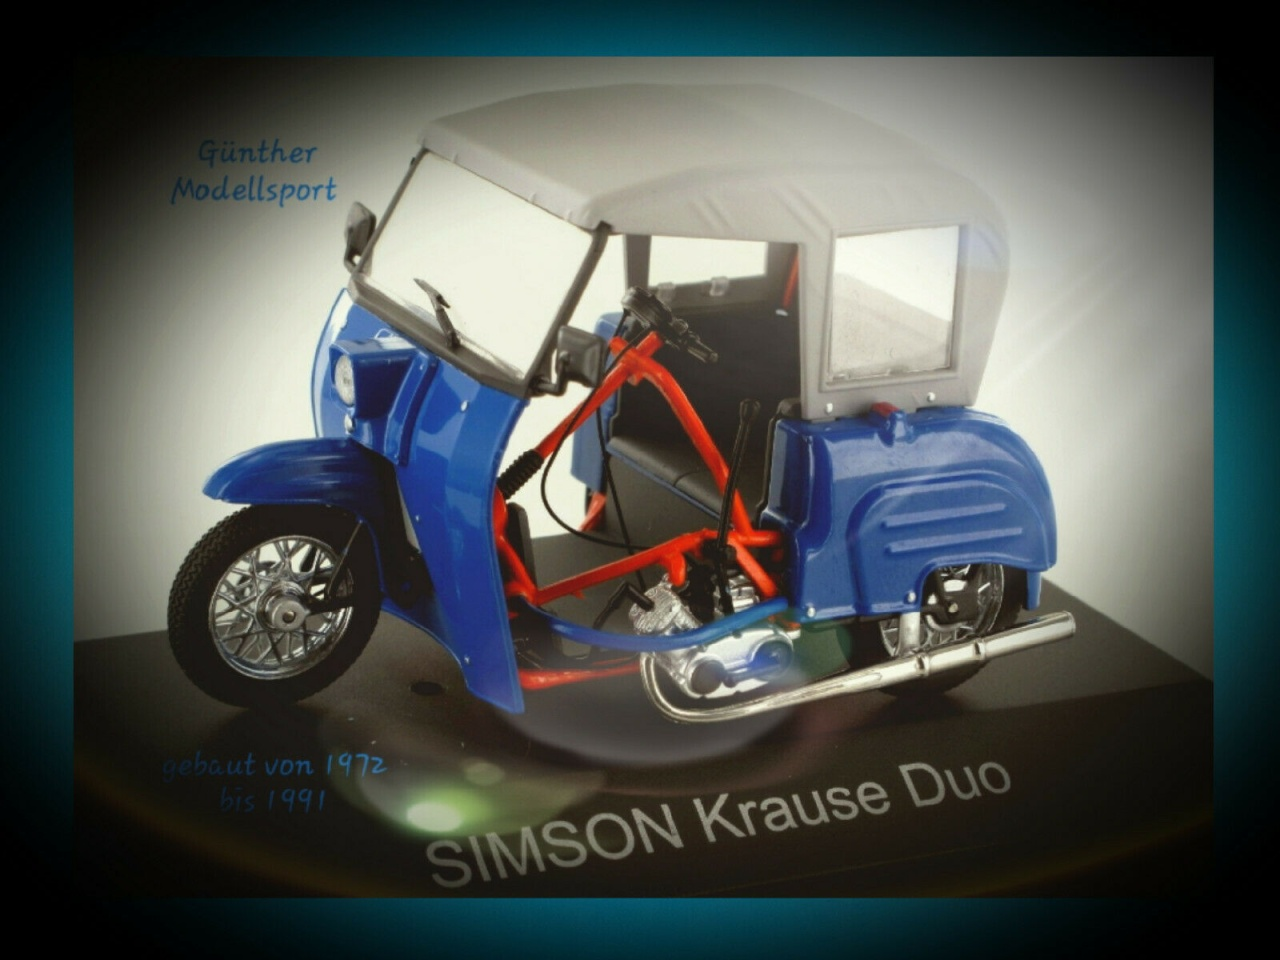 IXO-24129-B Simson Krause Duo RAL5009 - atlantikblau,1:24